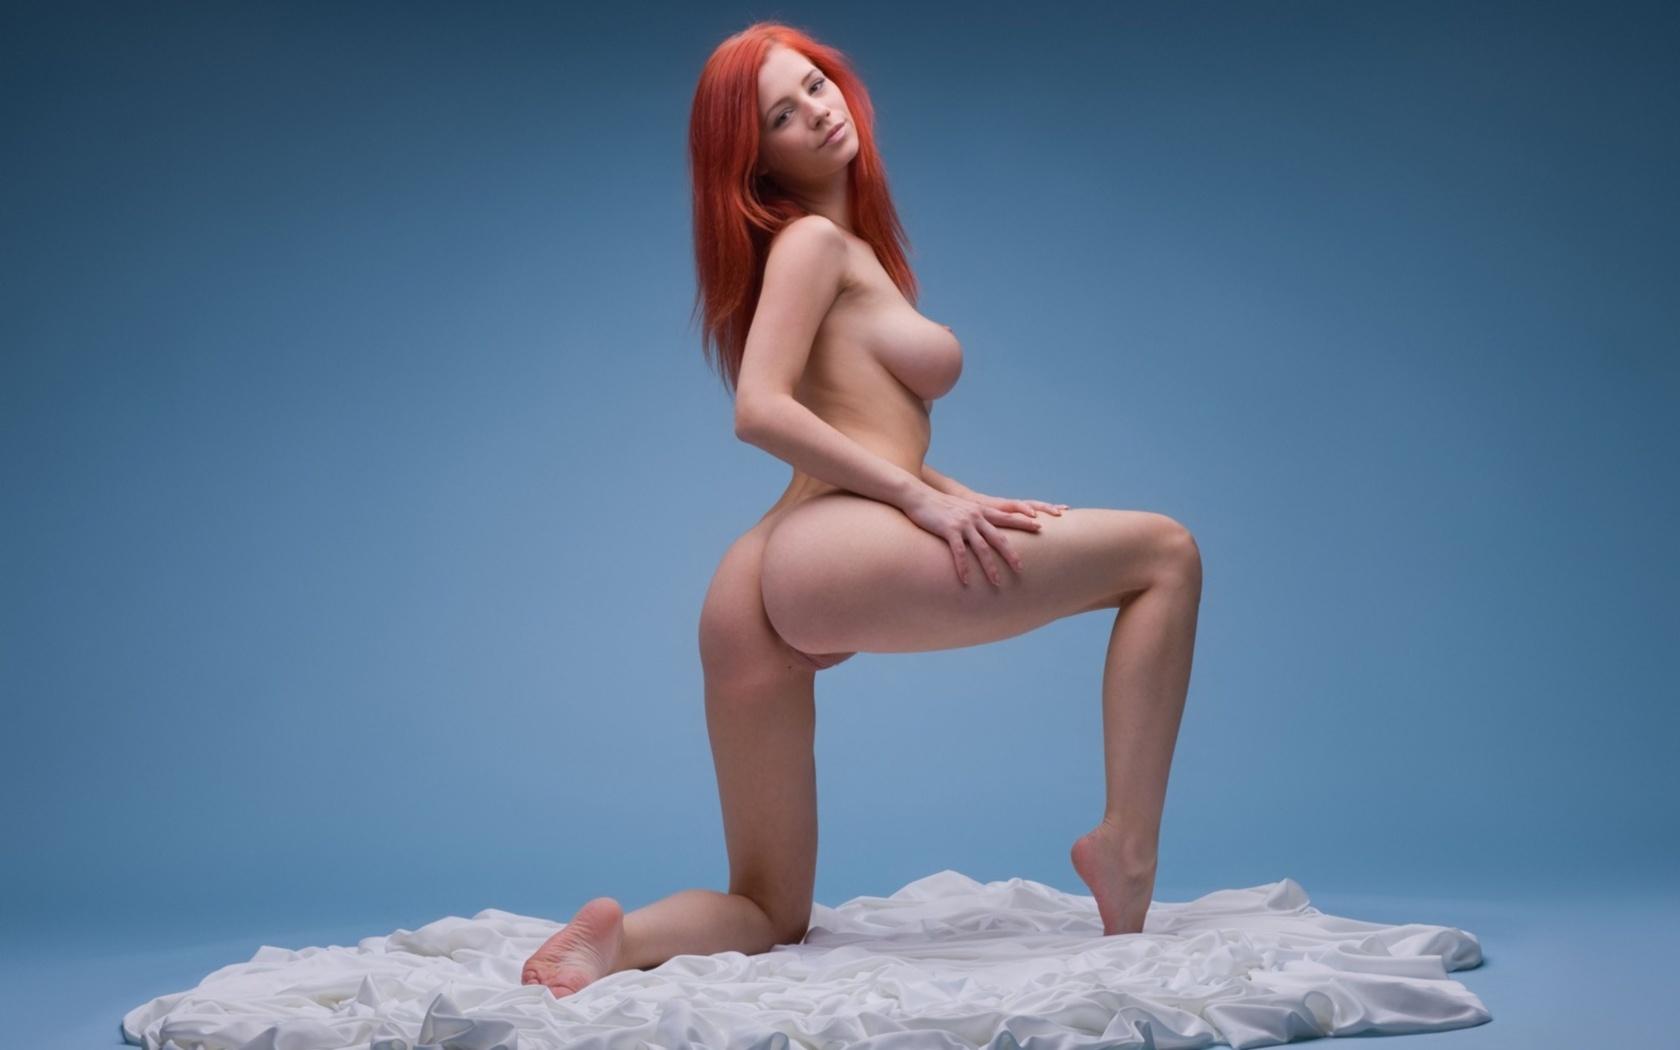 Something Hd vagina nude shots regret